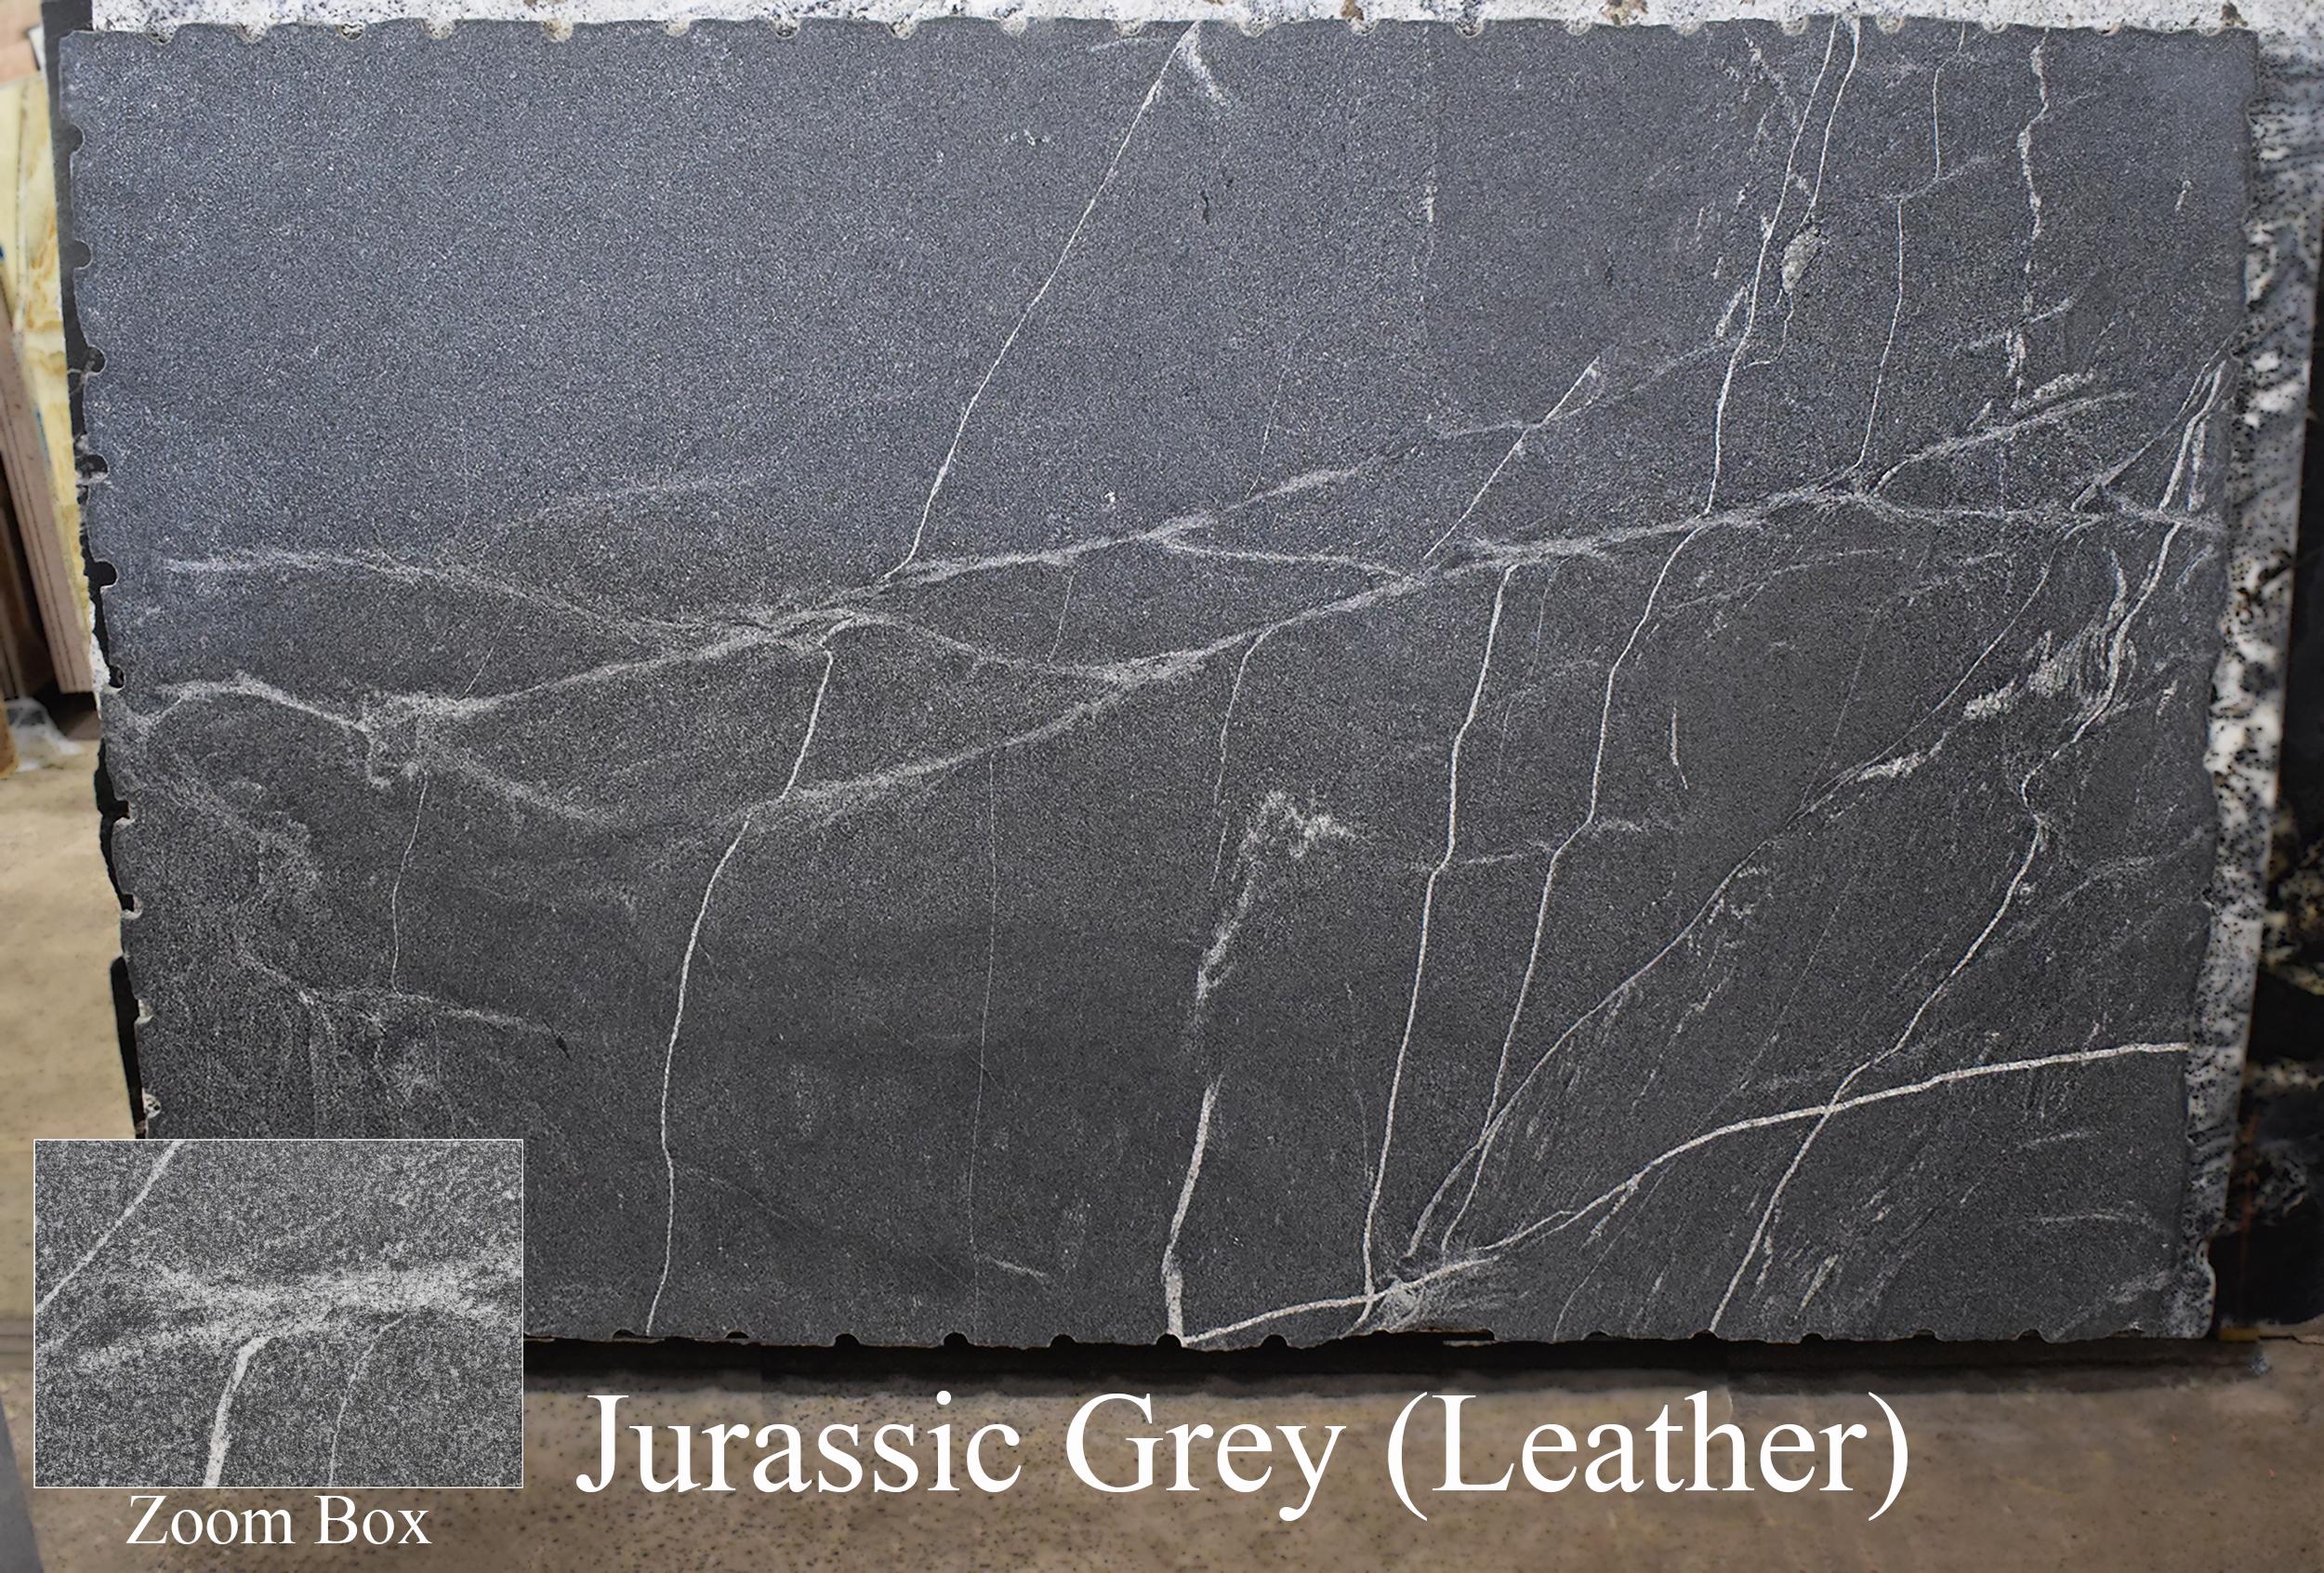 JURASSIC GREY (LEATHER)